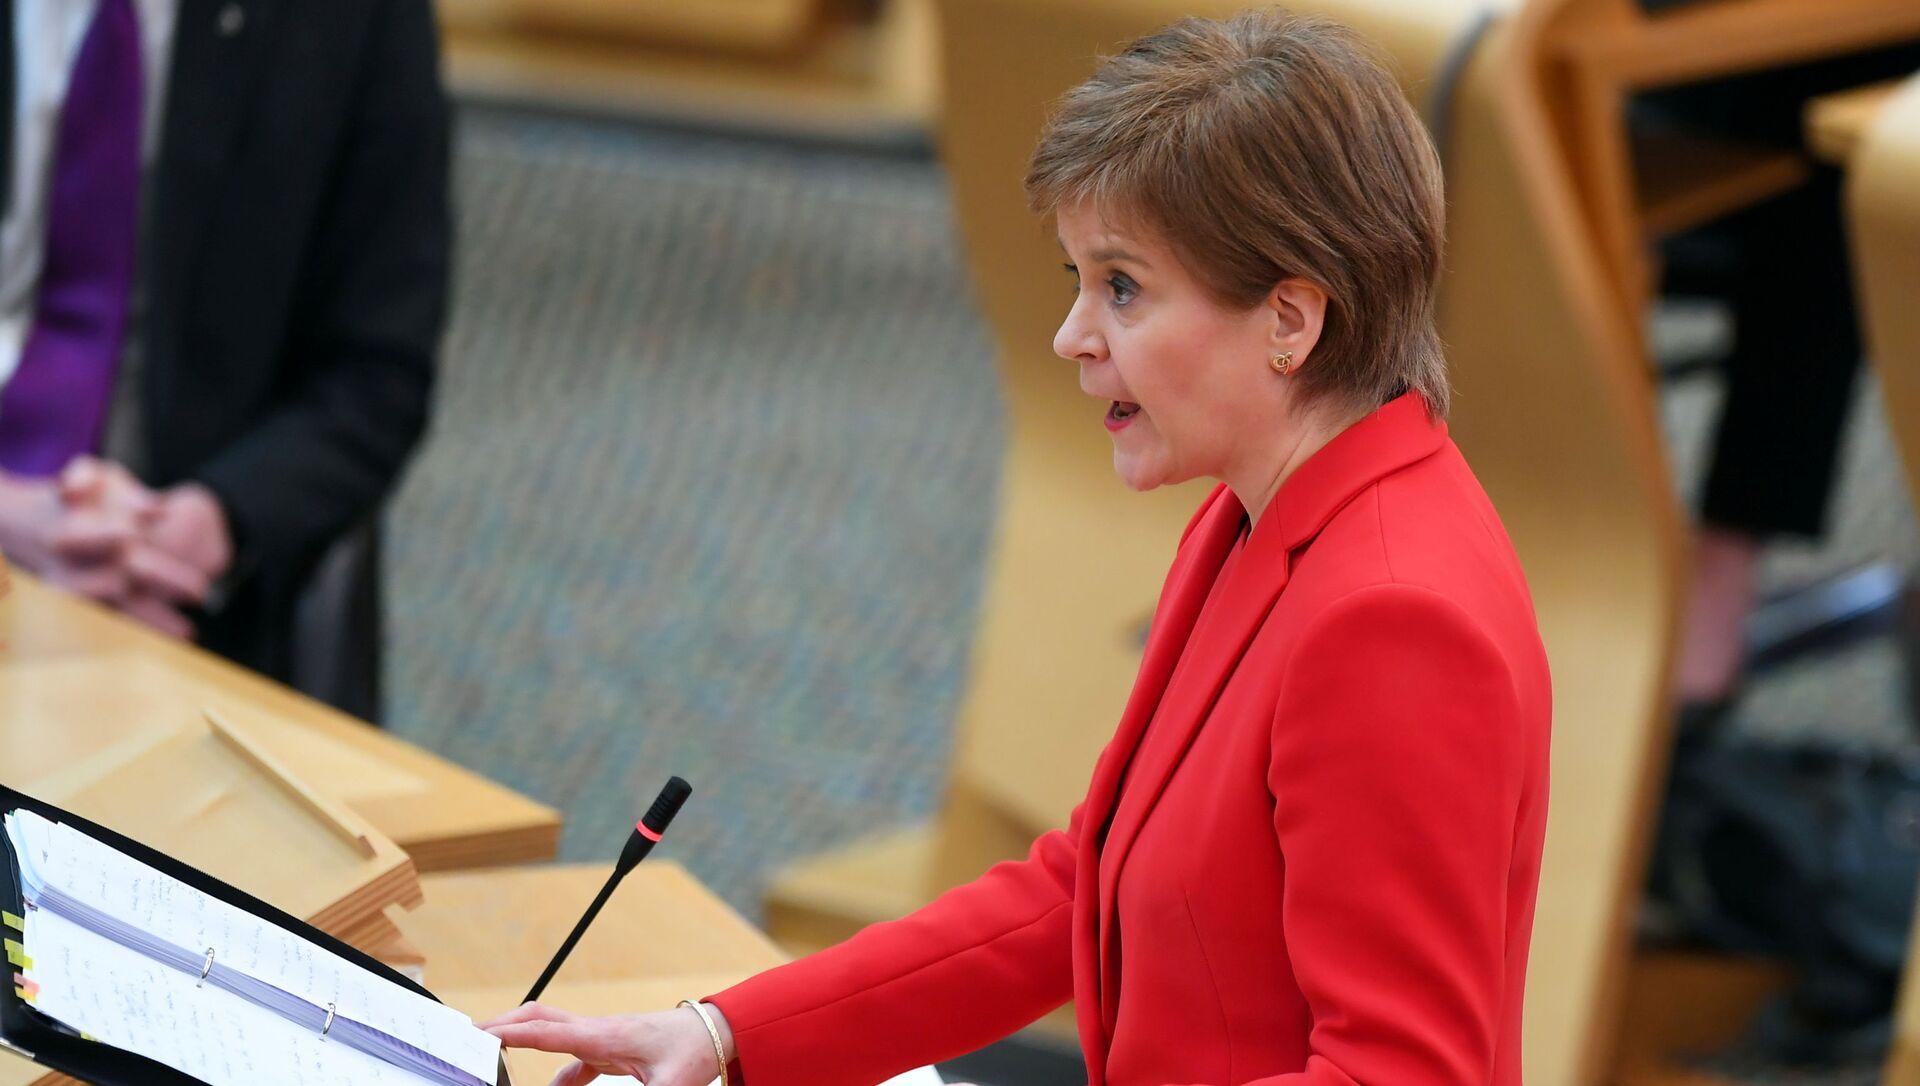 Scotland's First Minister Nicola Sturgeon attends First Minister's Questions at the Scottish Parliament in Edinburgh, Scotland, Britain March 18, 2021 - Sputnik International, 1920, 23.03.2021